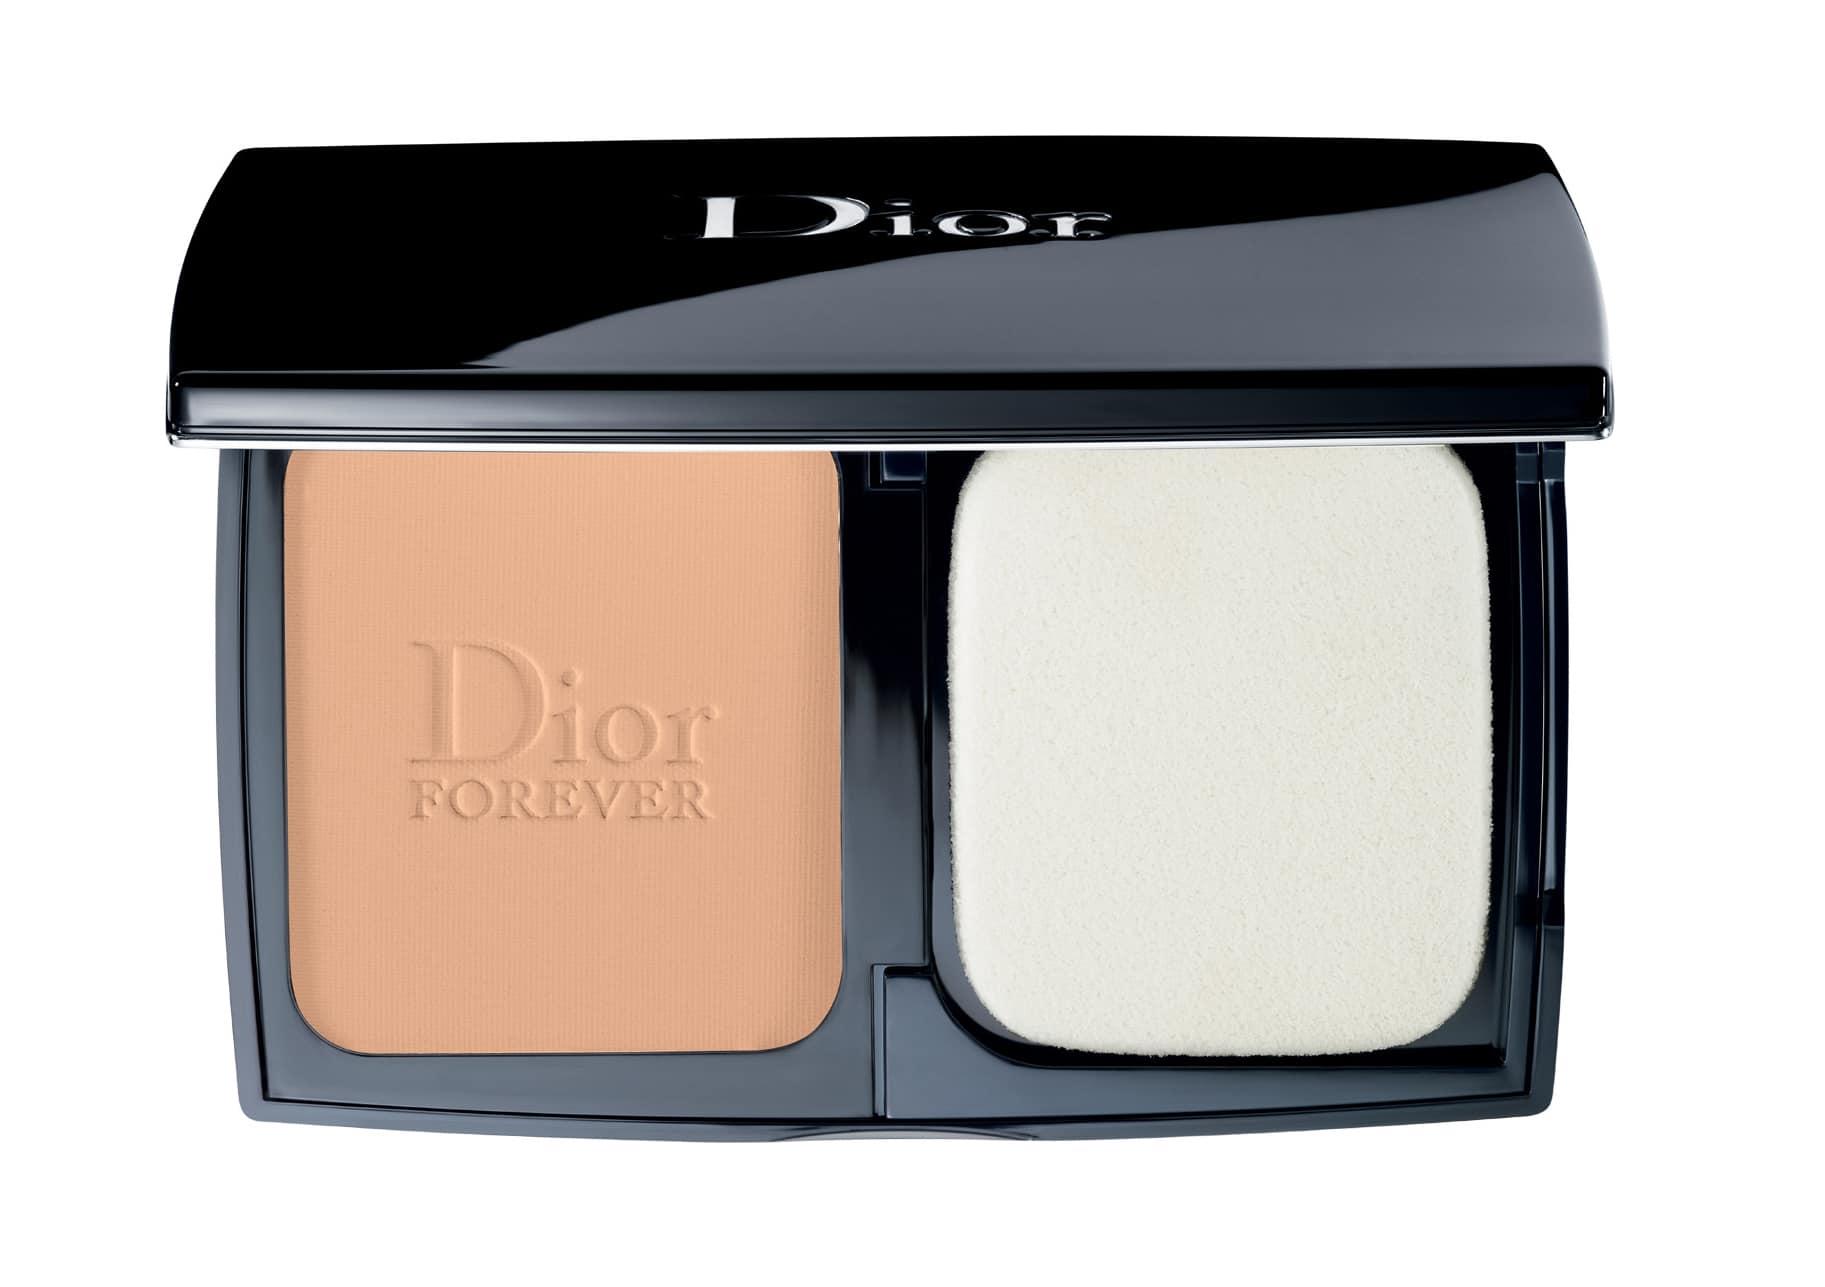 Dior Diorskin Forever Extreme Control Fondotinta